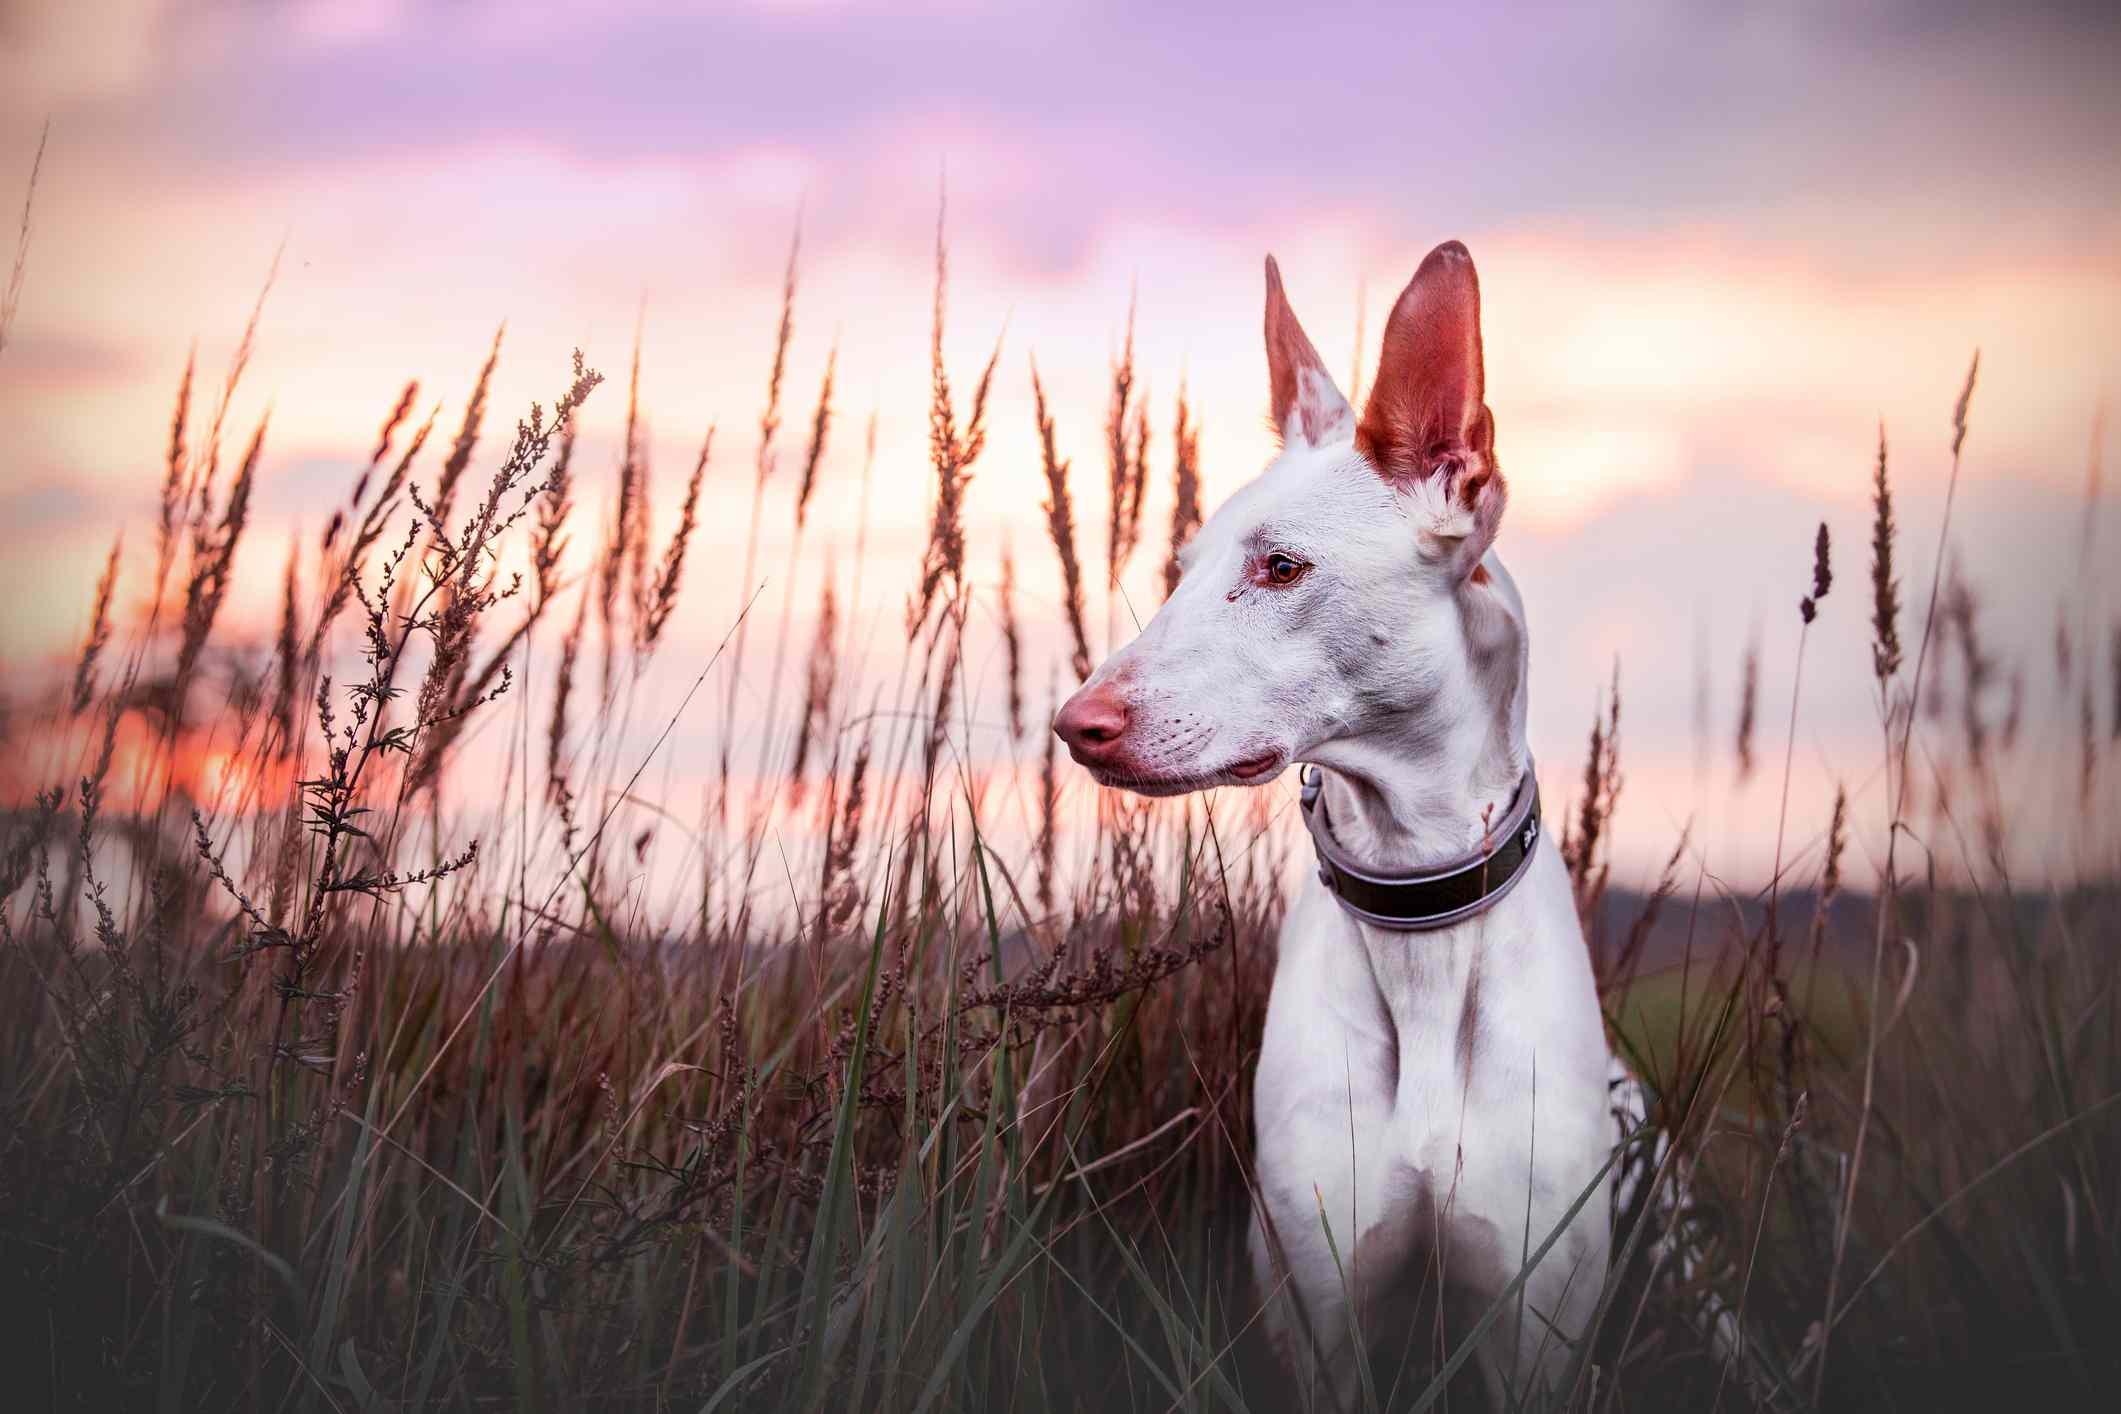 White Ibizan hound